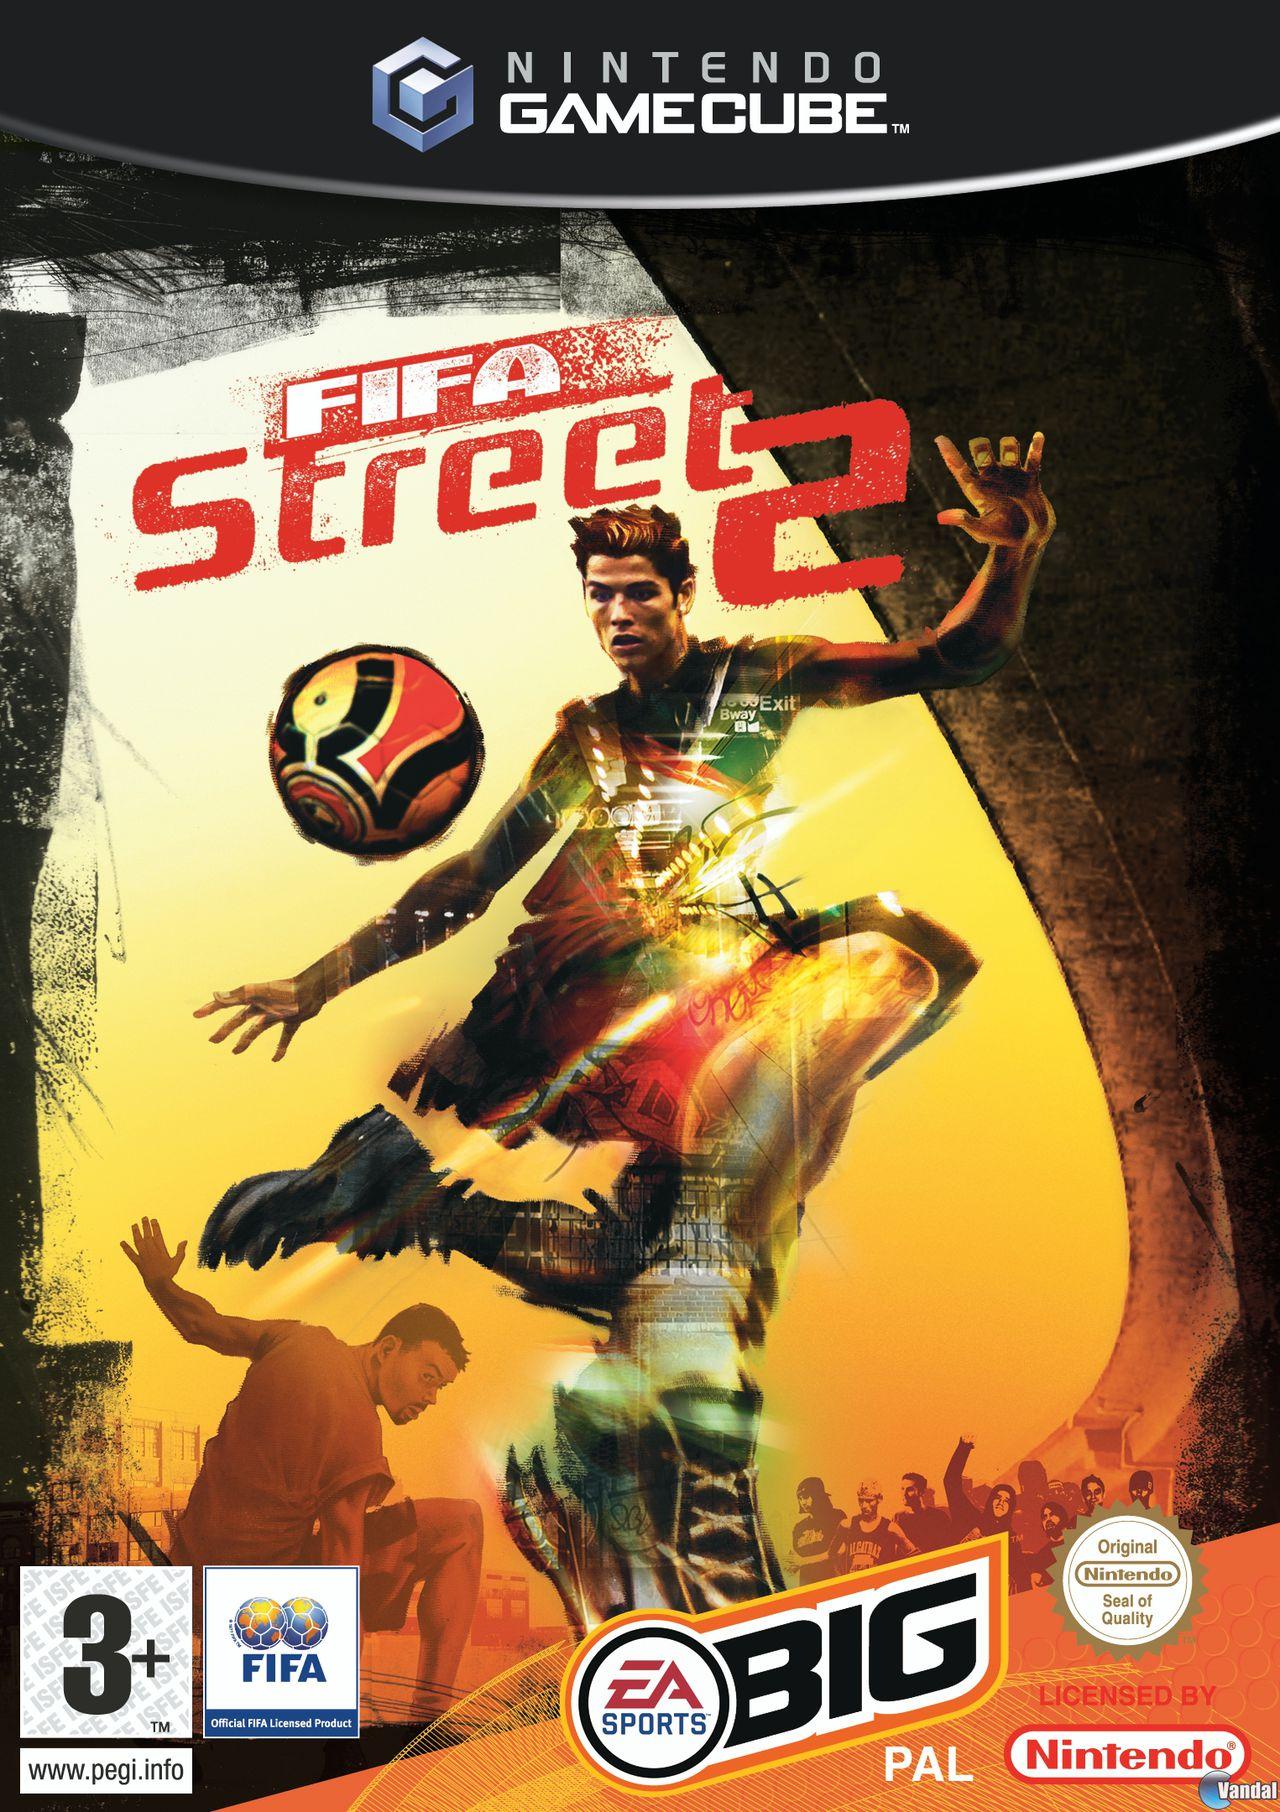 Imagen 6 de FIFA Street 2 para GameCube